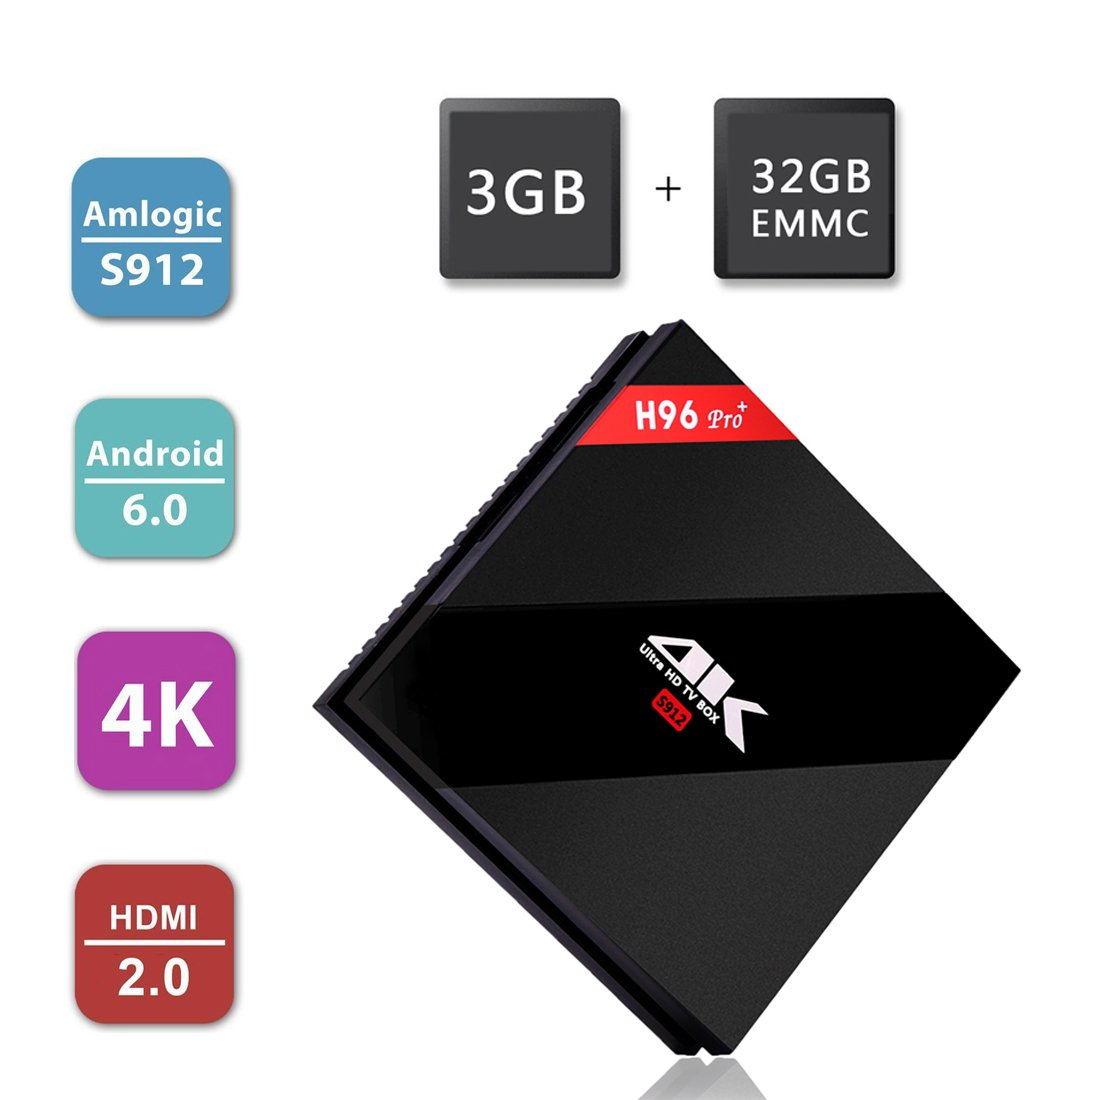 EstgoSZ H96 Pro 3GB RAM 32GB ROM TV Box Amlogic S912 Octa-core CPU Android 6.0 Dual-band WIFI 2.4GHz/5.0GHz Bluetooth 4.1 1000M LAN 4K 2K Set Top Box 2017 Model